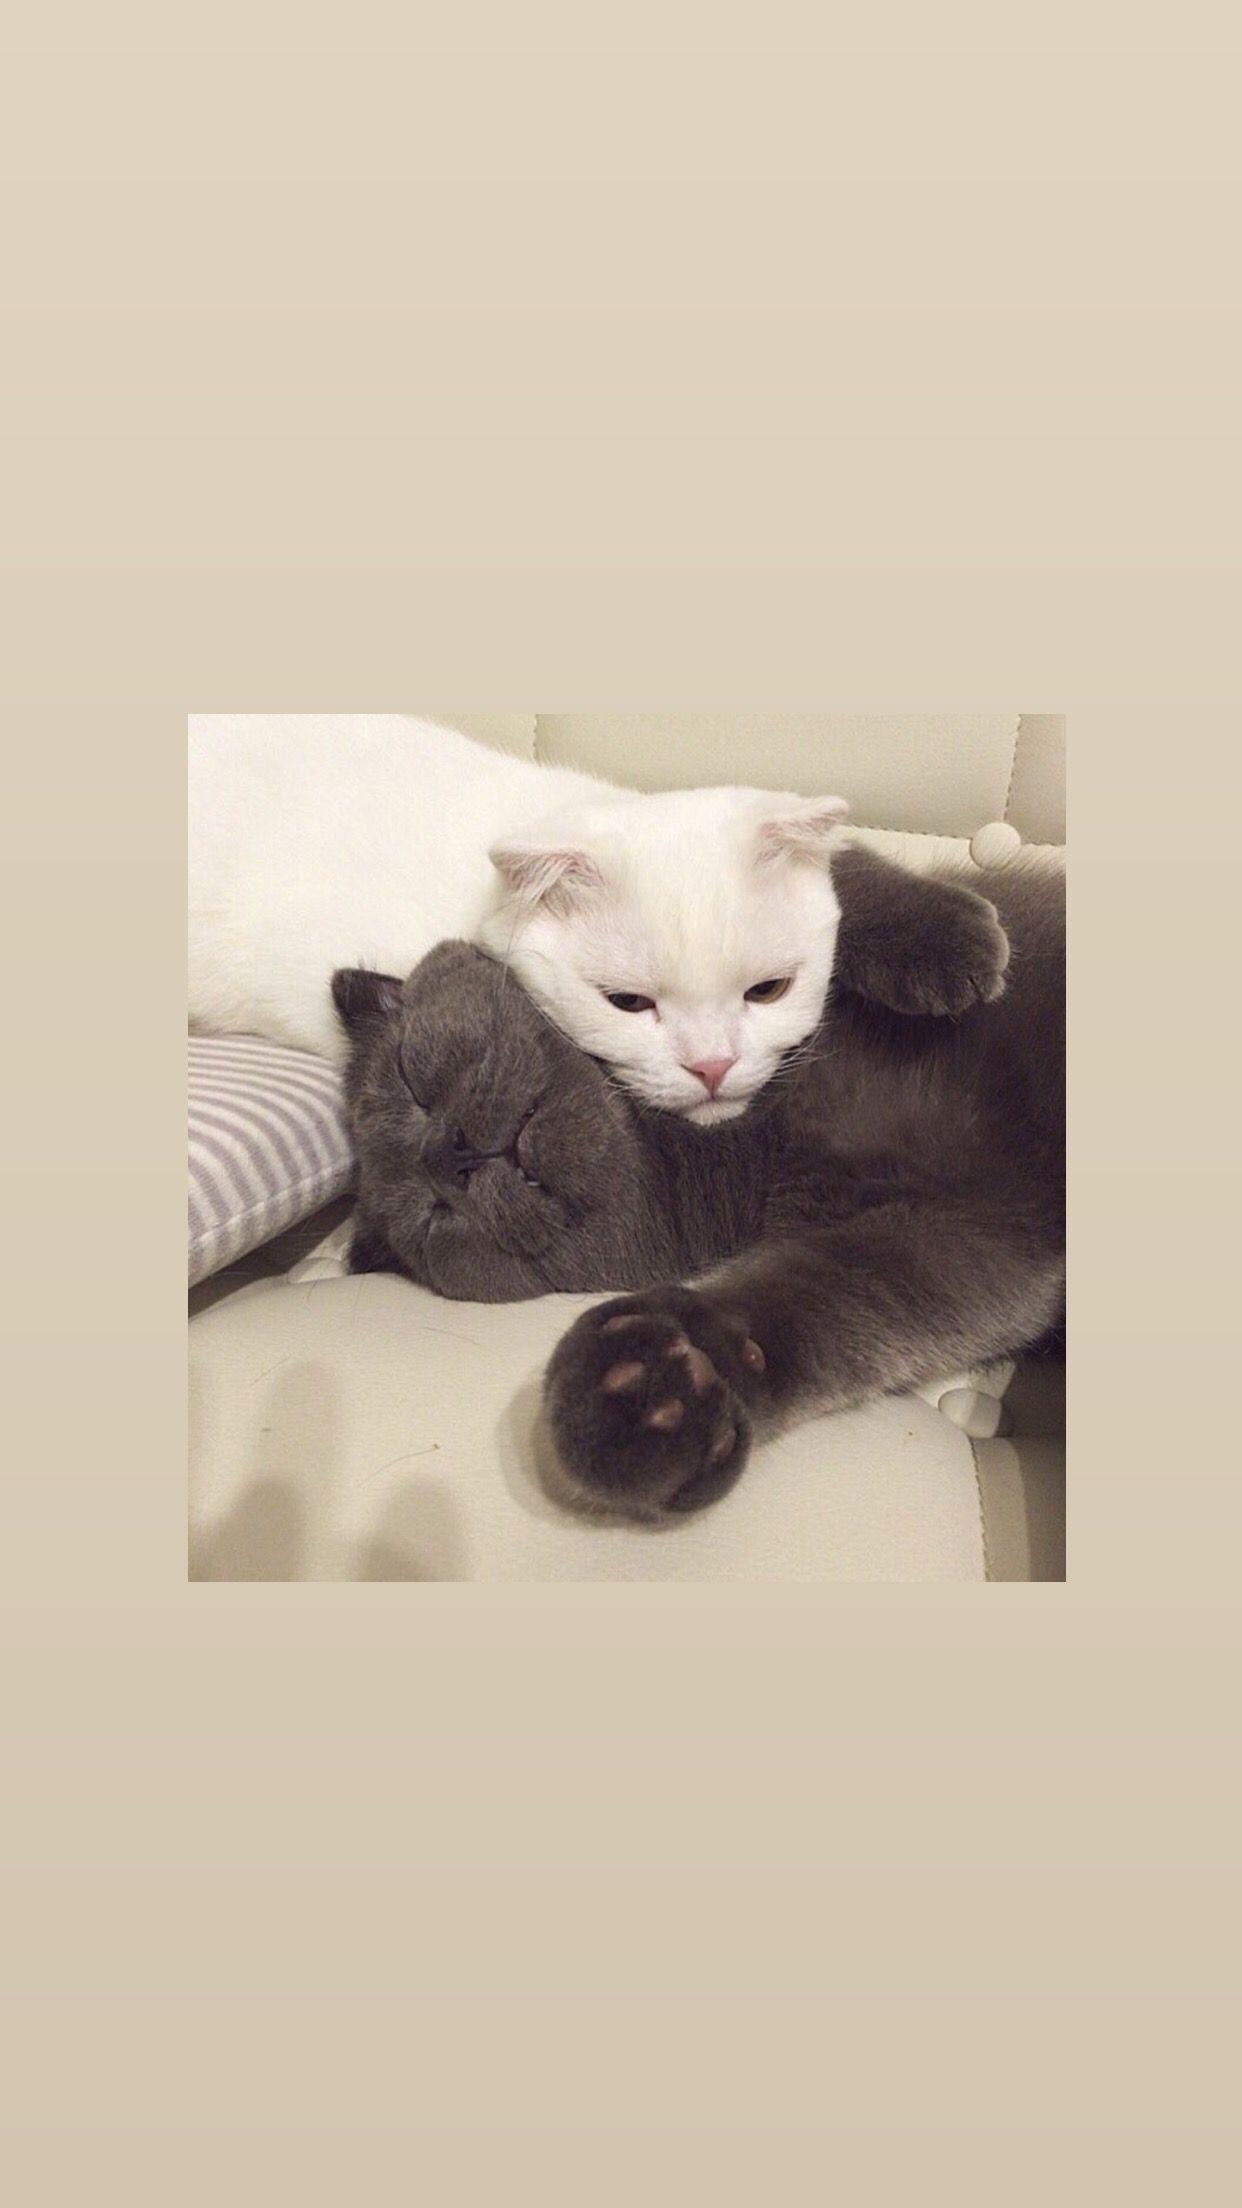 Instastaerry.night🍓 Cat aesthetic, Cat phone wallpaper